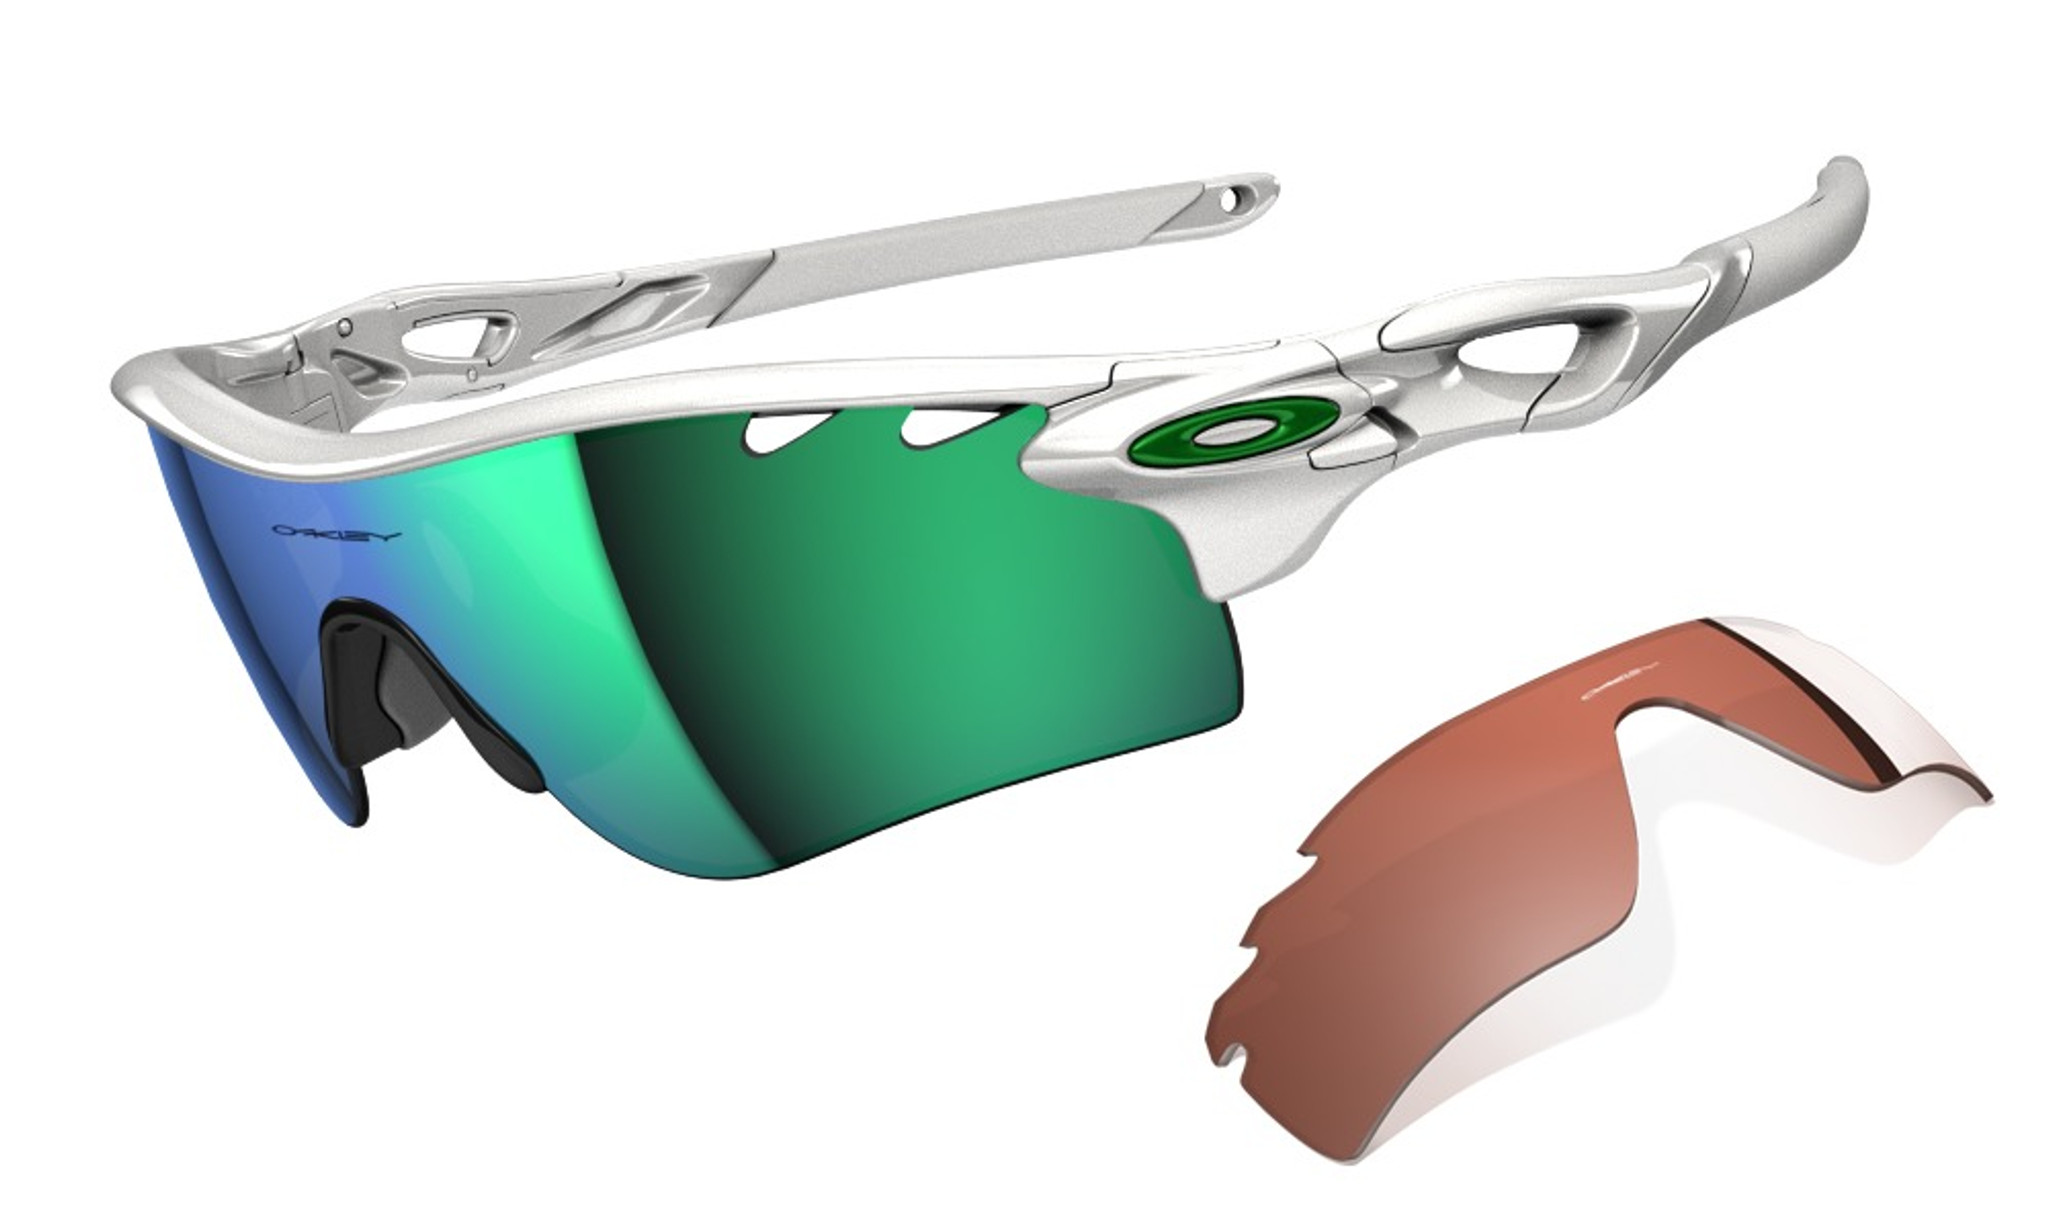 3feba1fd3 Oakley Sports Performance Sunglasses - Radarlock - Polished White Frame -  Jade Iridium Vented & VR28 Vented Lens - OO9181-22